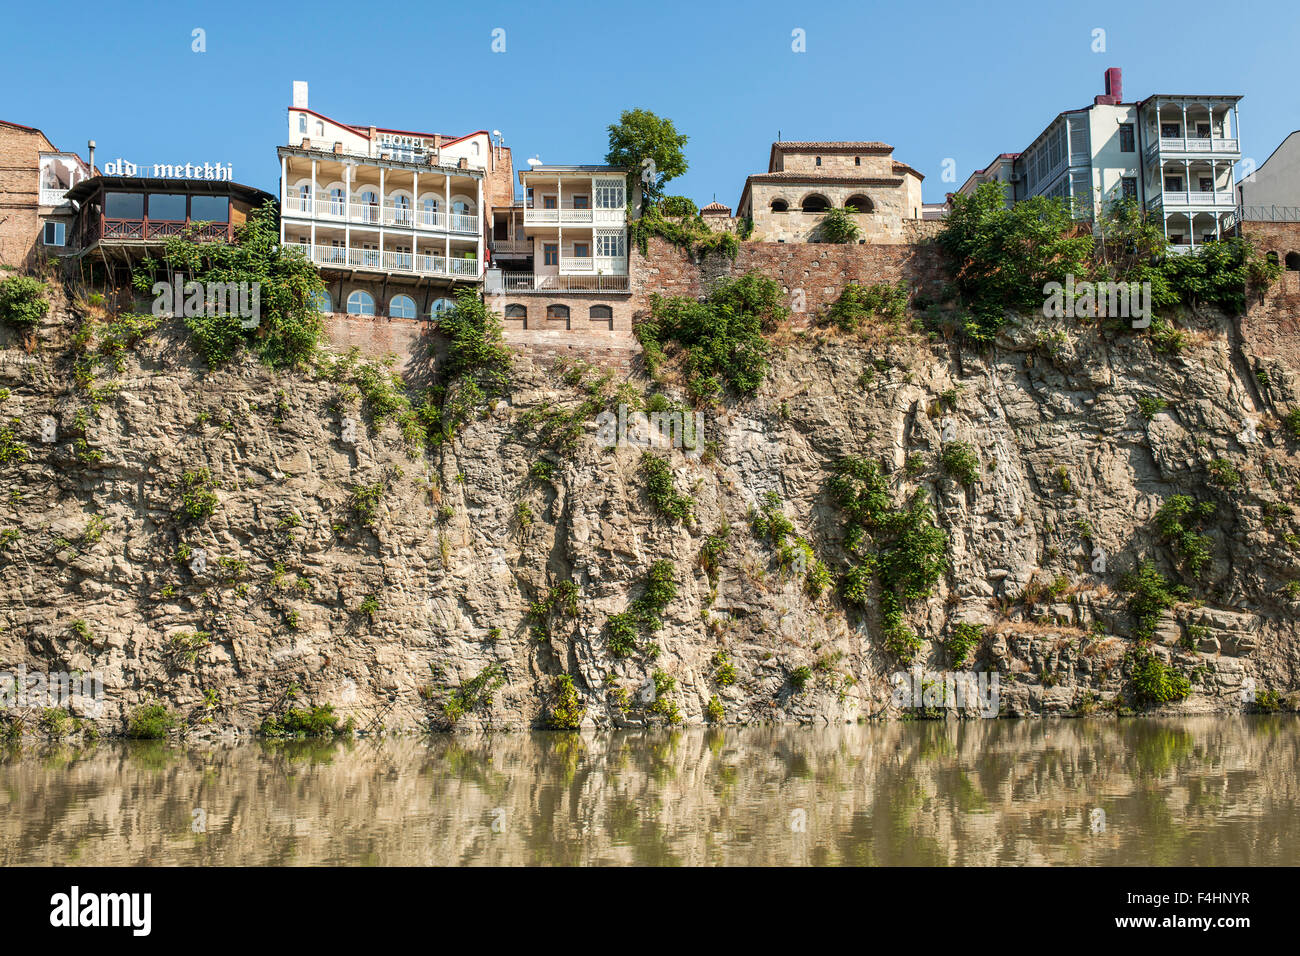 Buildings lining the Kura River in Tbilisi, the capital of Georgia. - Stock Image